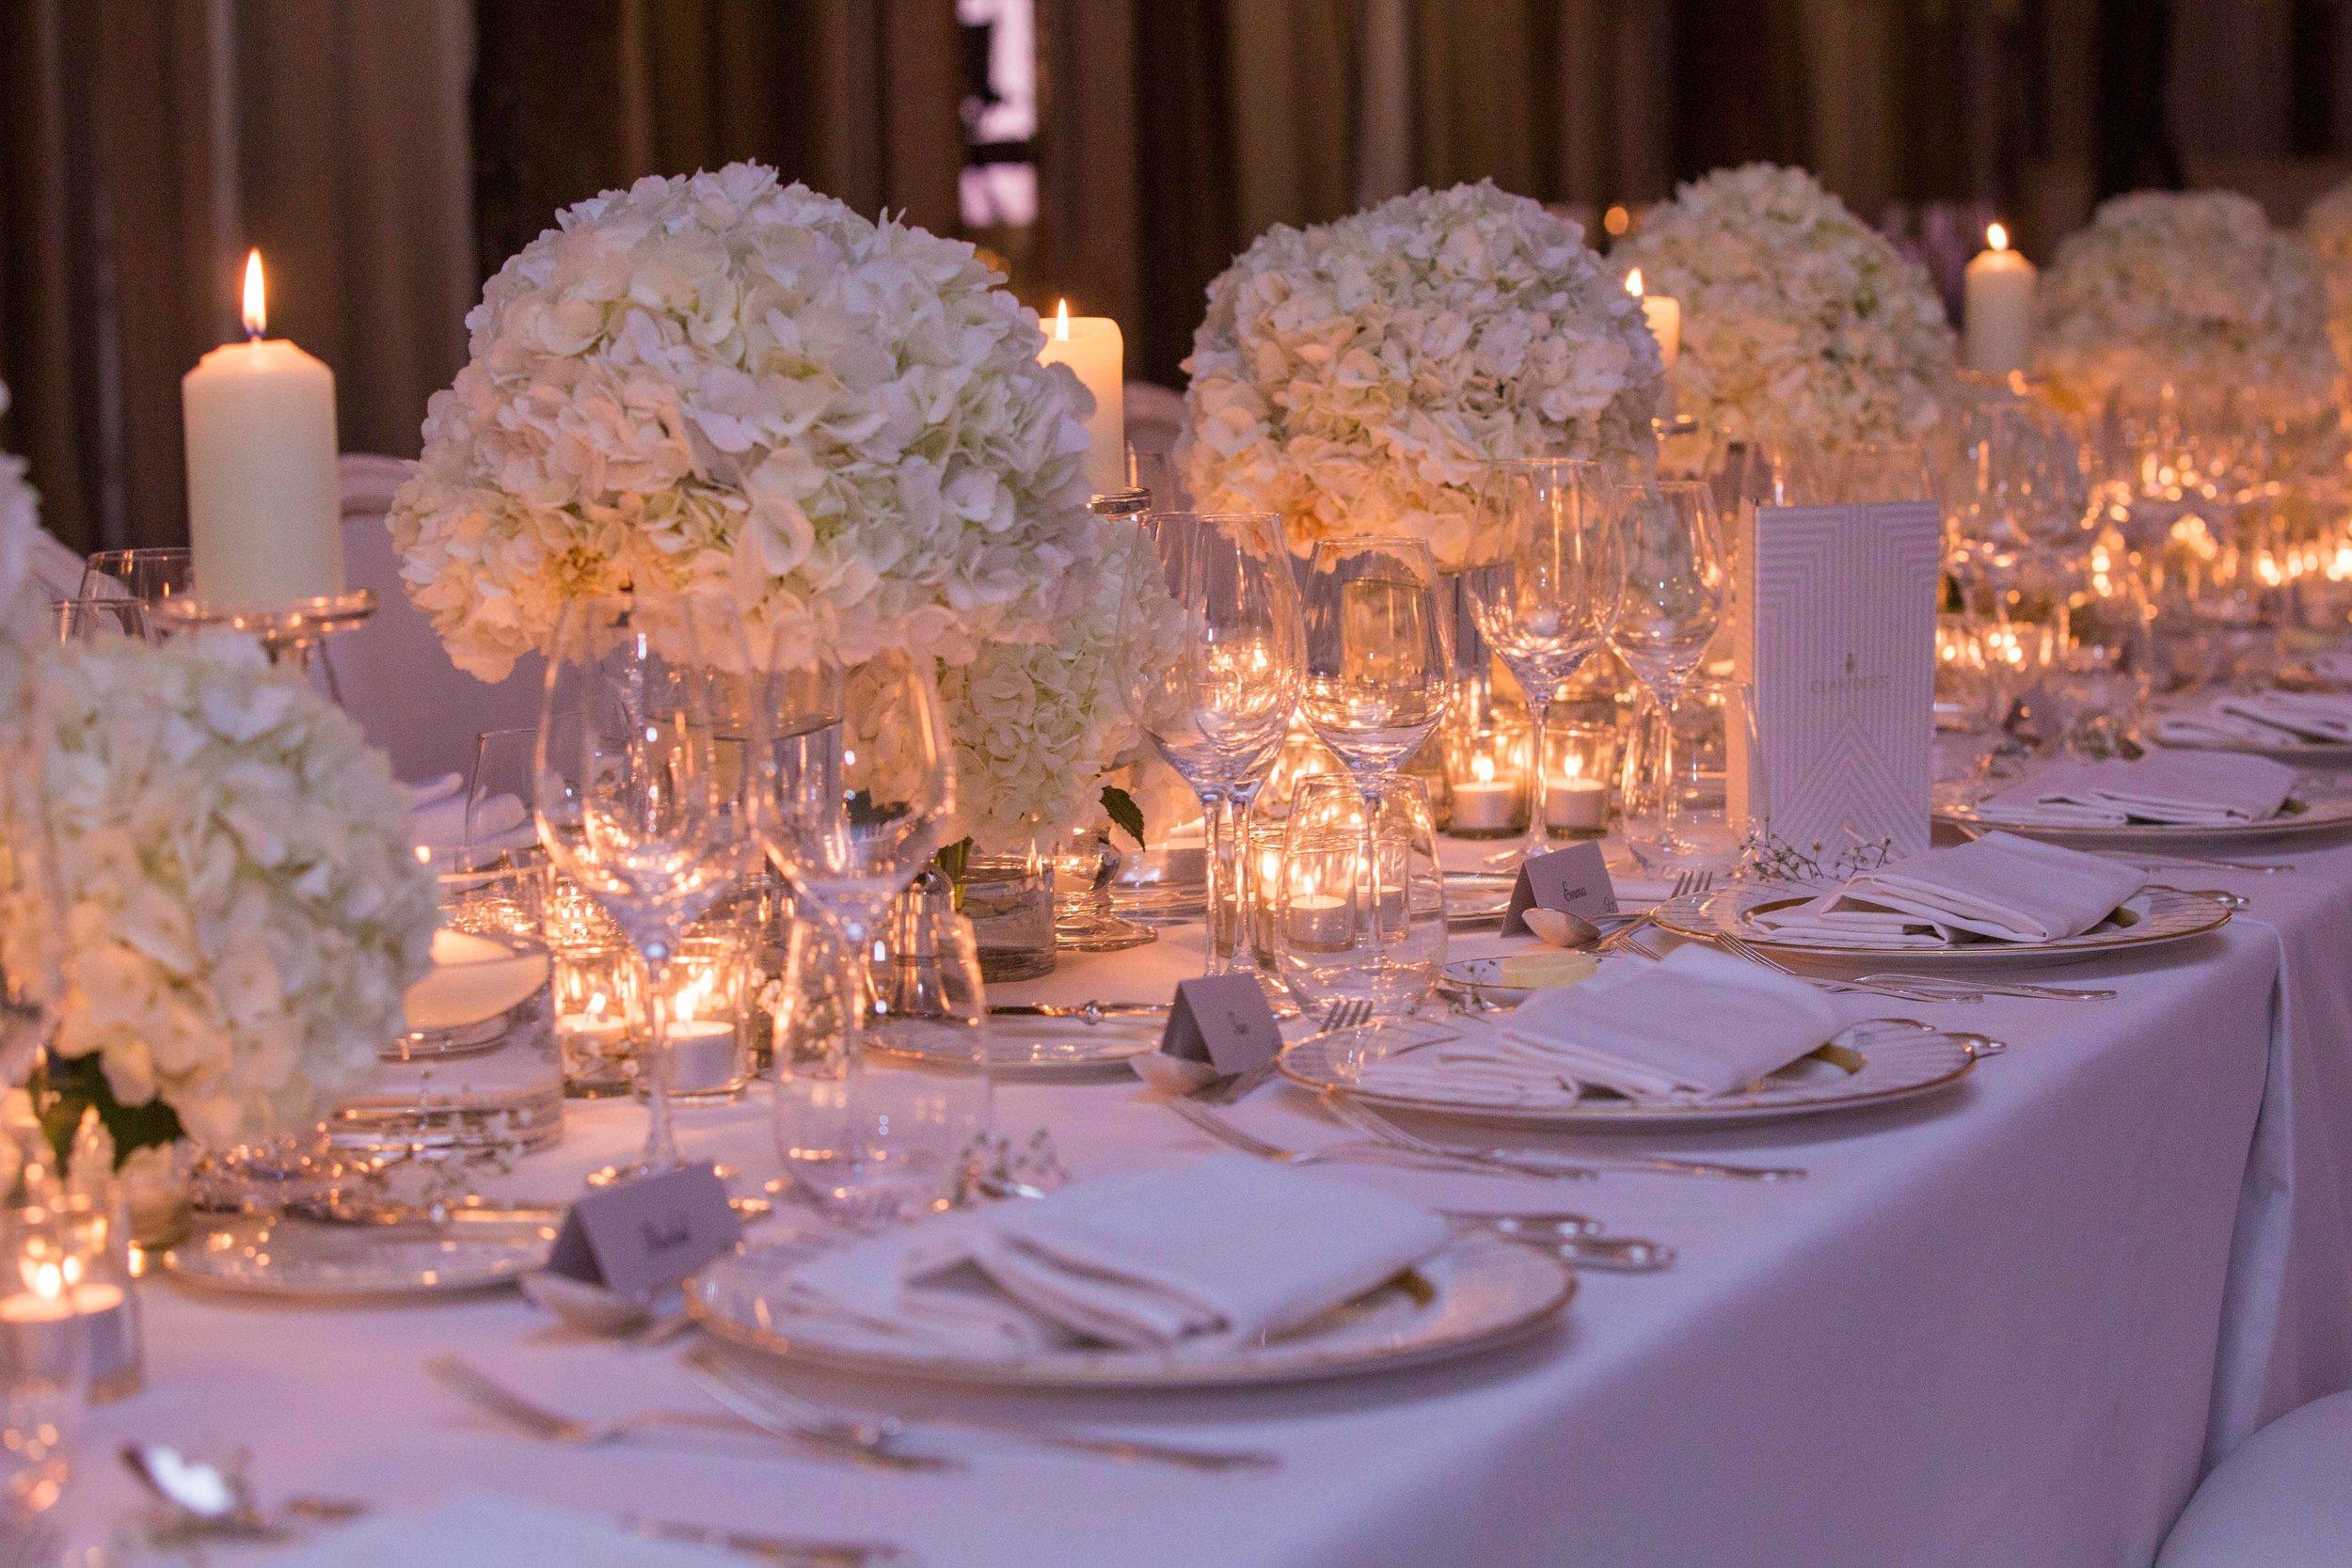 claridges-hotel-wedding-photographer-london-mayfair-natalia-smith-photography-95.jpg